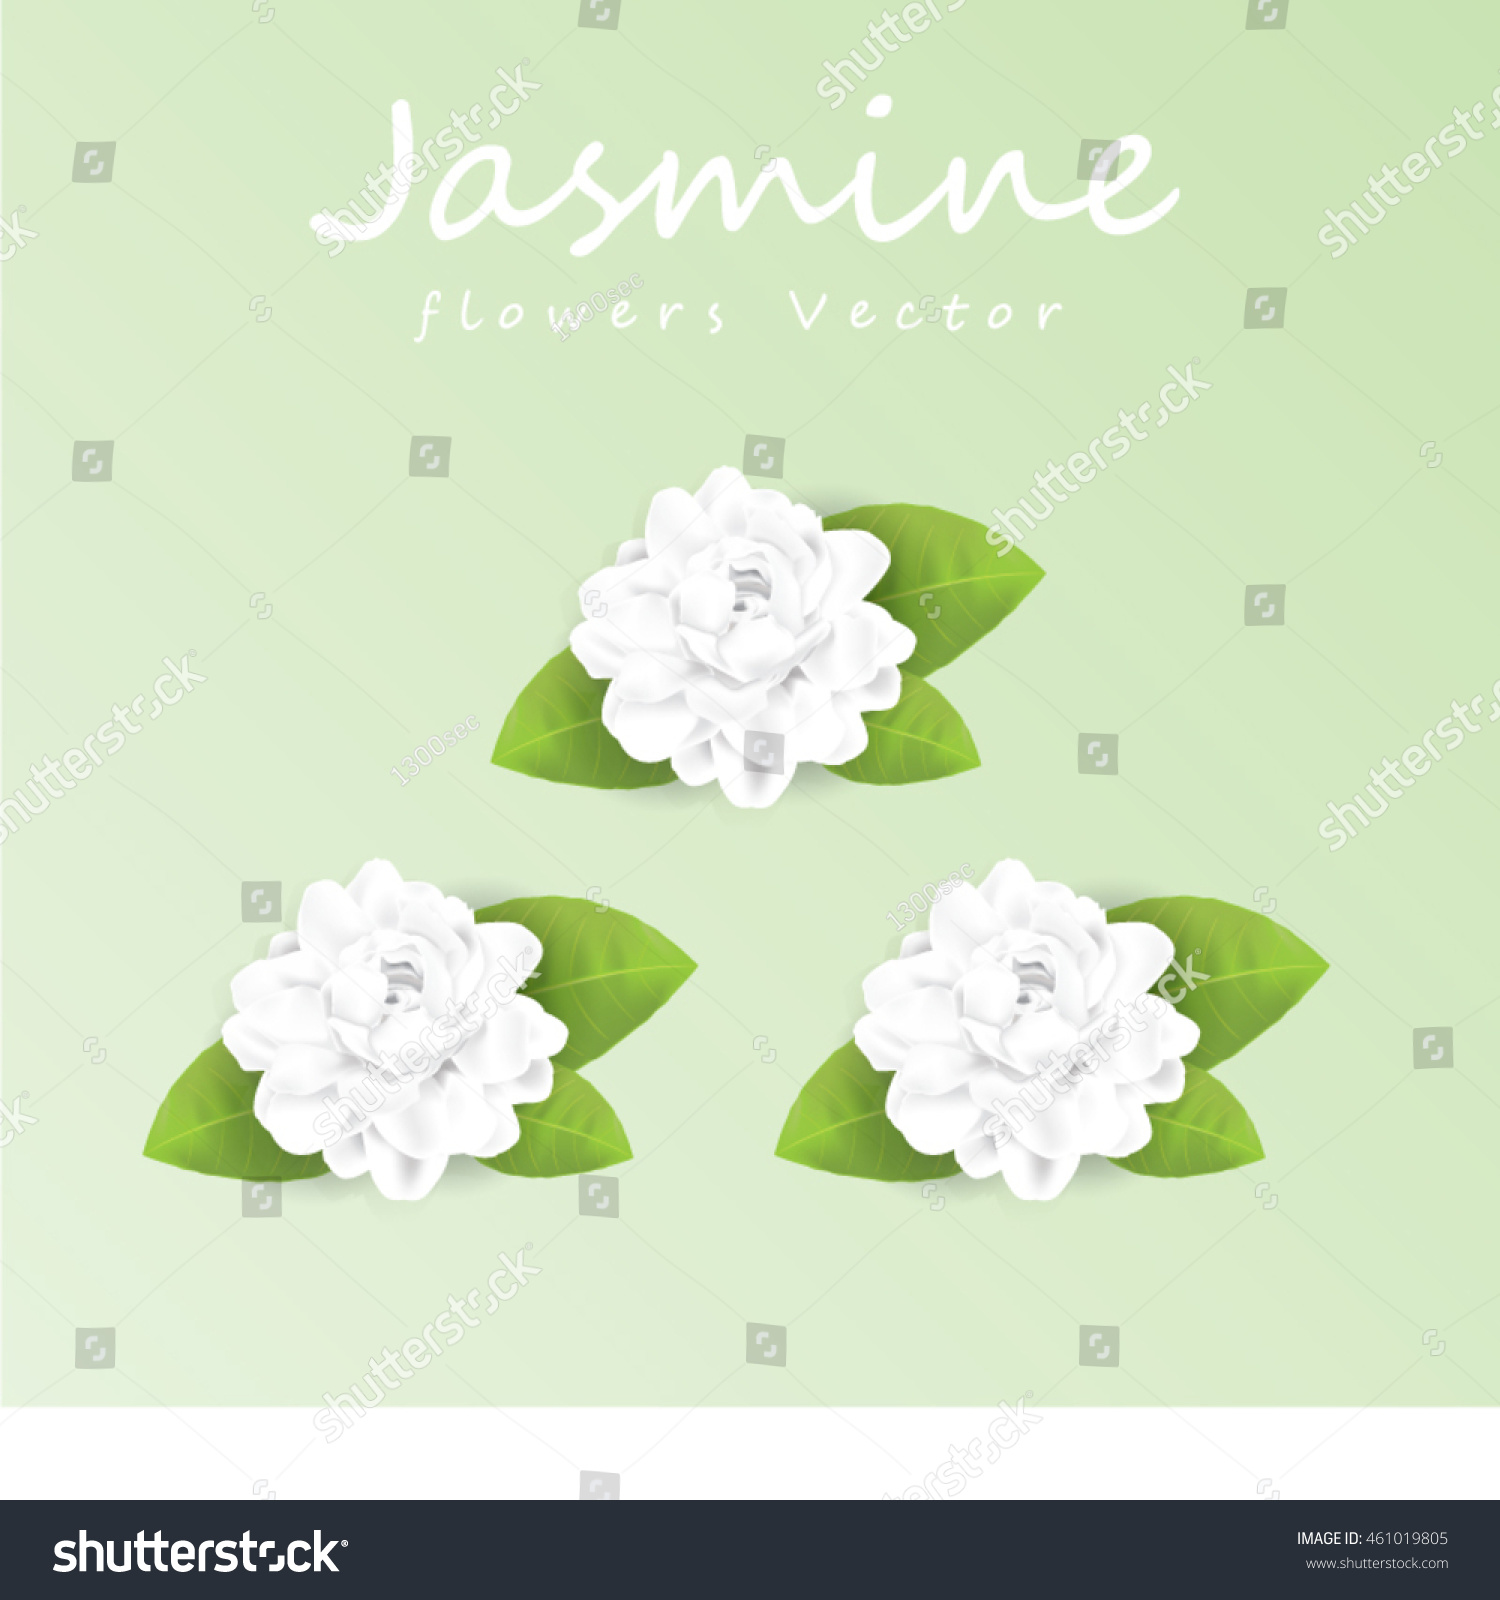 Jasmine Flower Vector Illustration Stock Vector Royalty Free